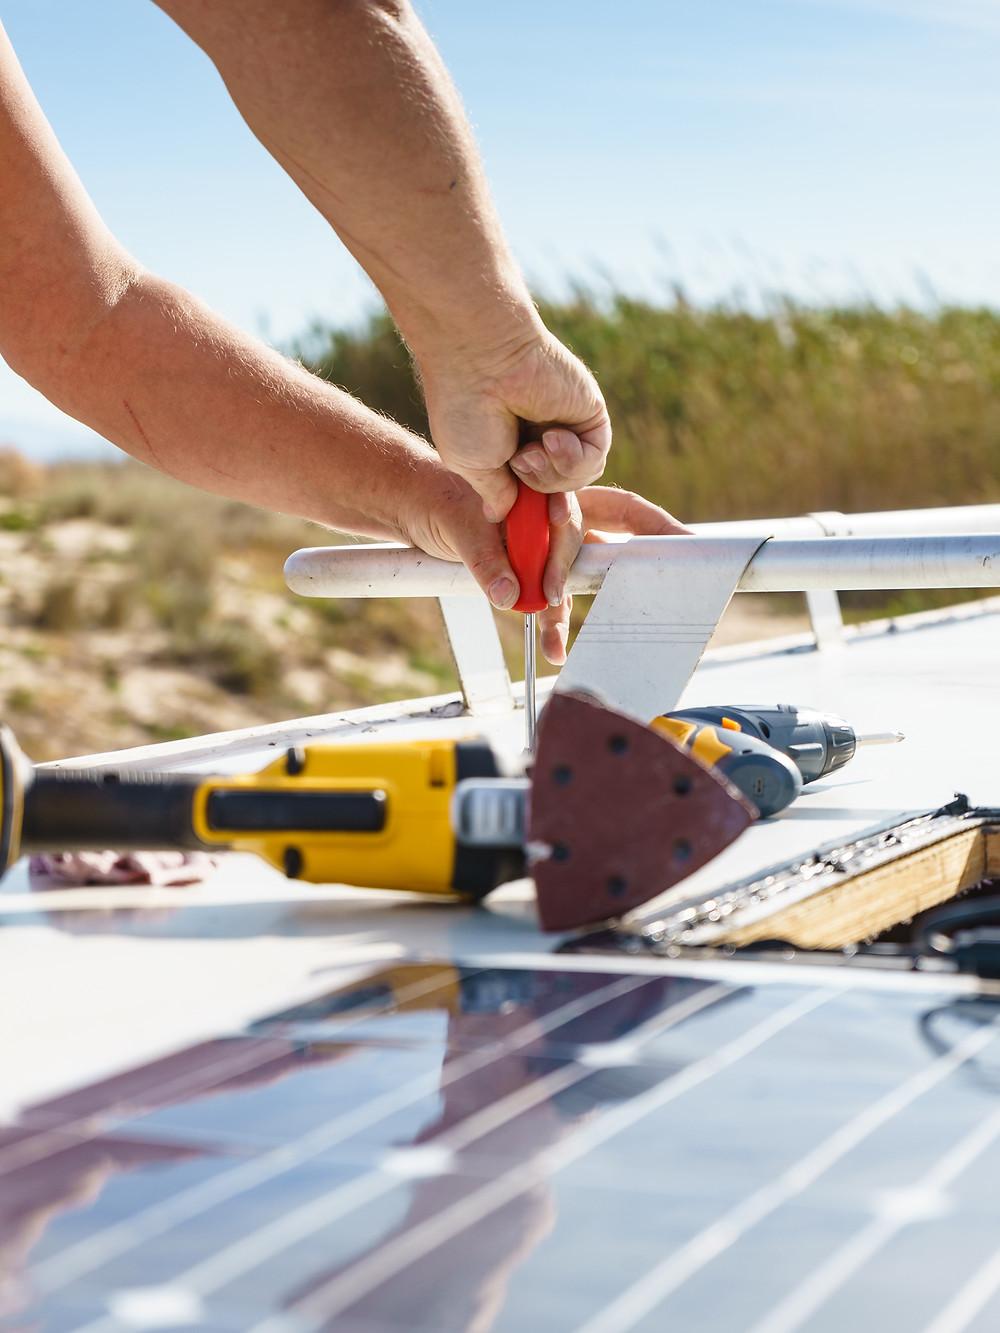 RV Solar Installation near Fresno, California by Sbrega Electric in Coarsegold, CA